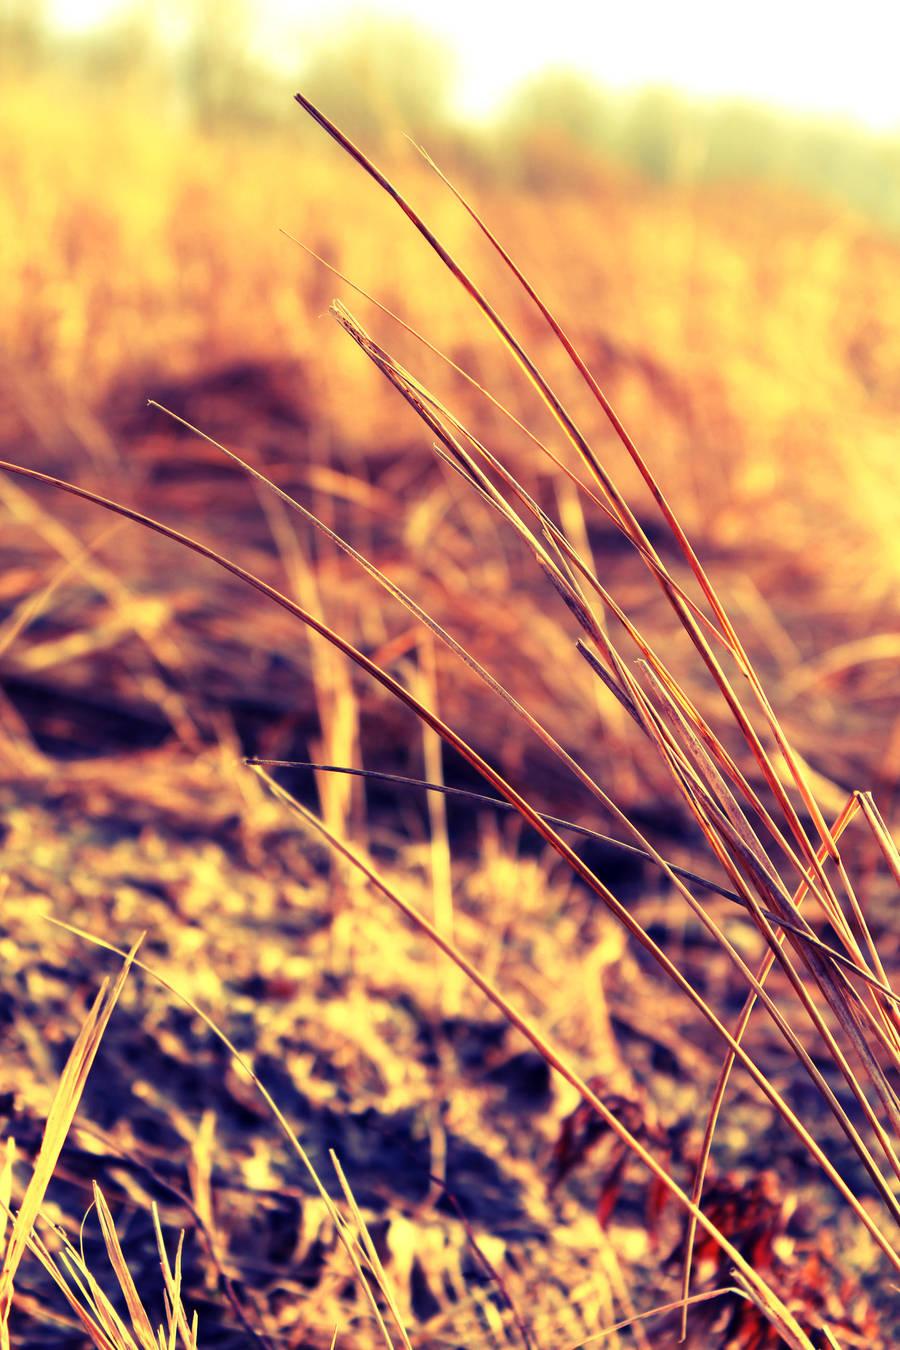 Autumn field by xposedbones